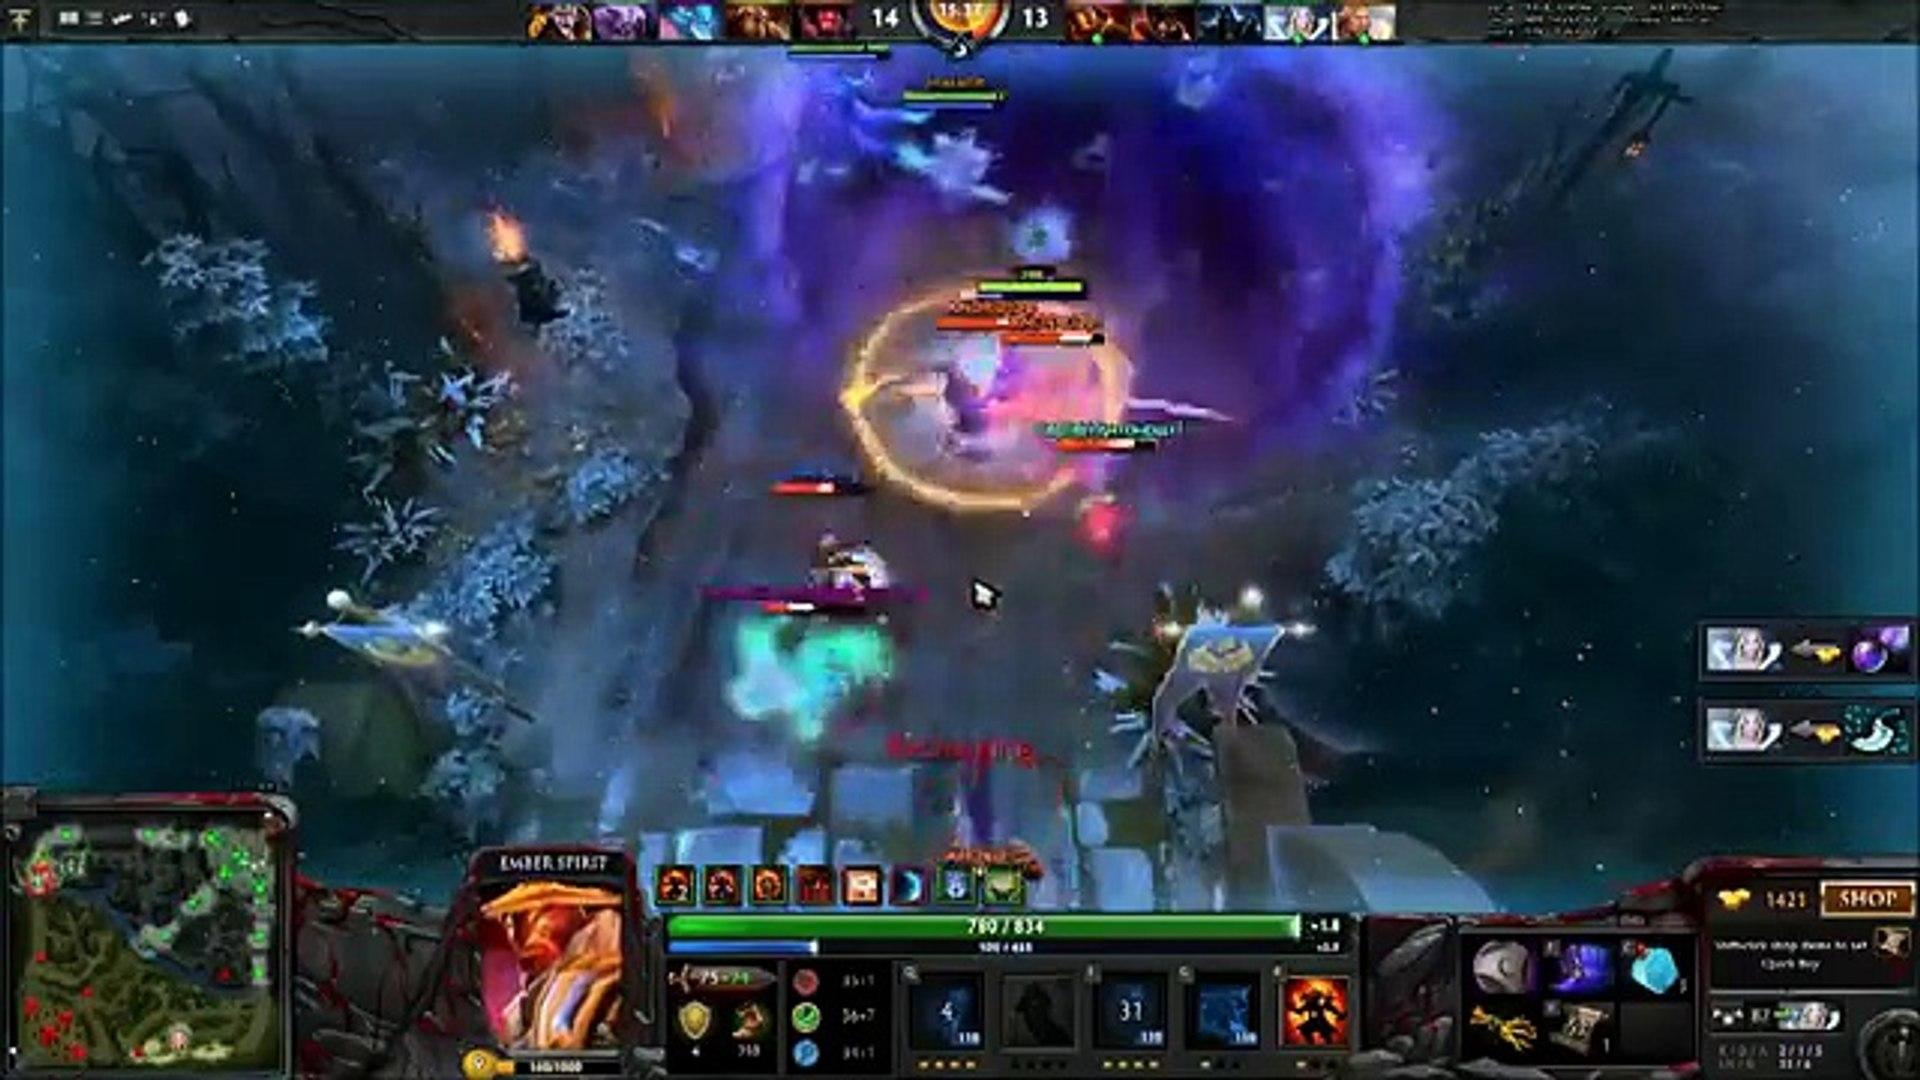 DotA 2 - SingSing (Ember Spirit) goes divine rapier rush in a pub game